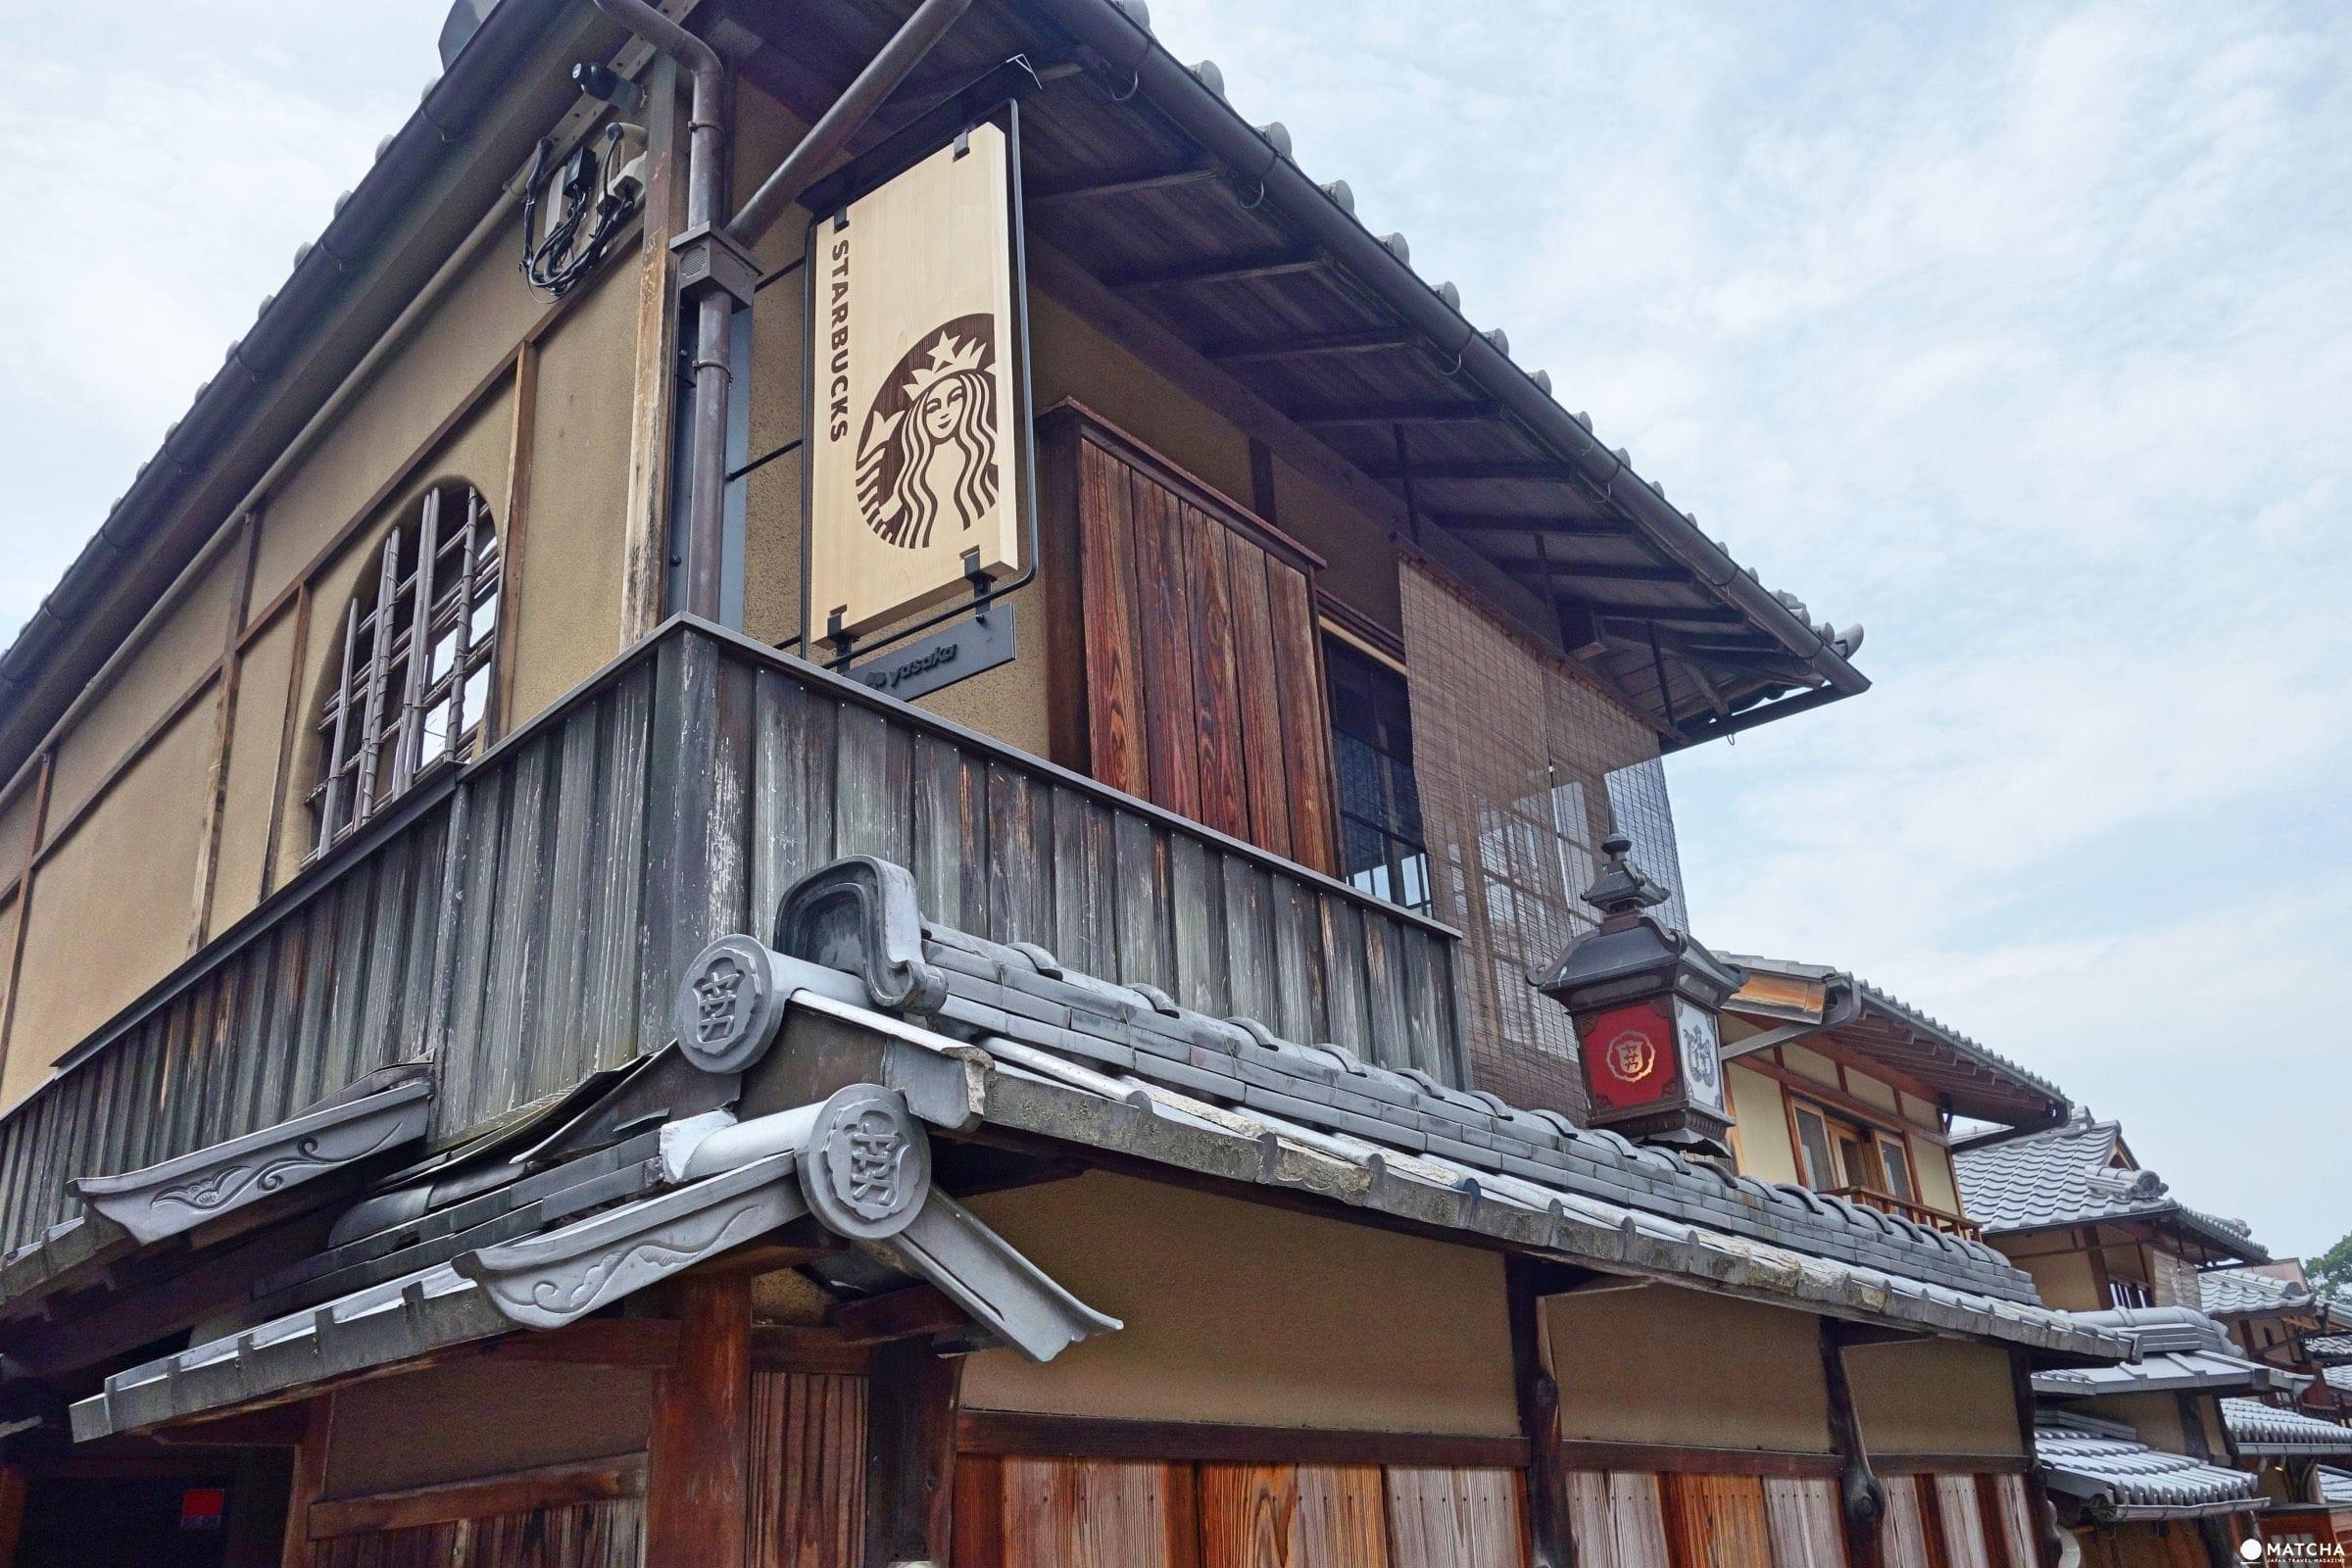 The World S First Starbucks With Tatami Kyoto Ninenzaka